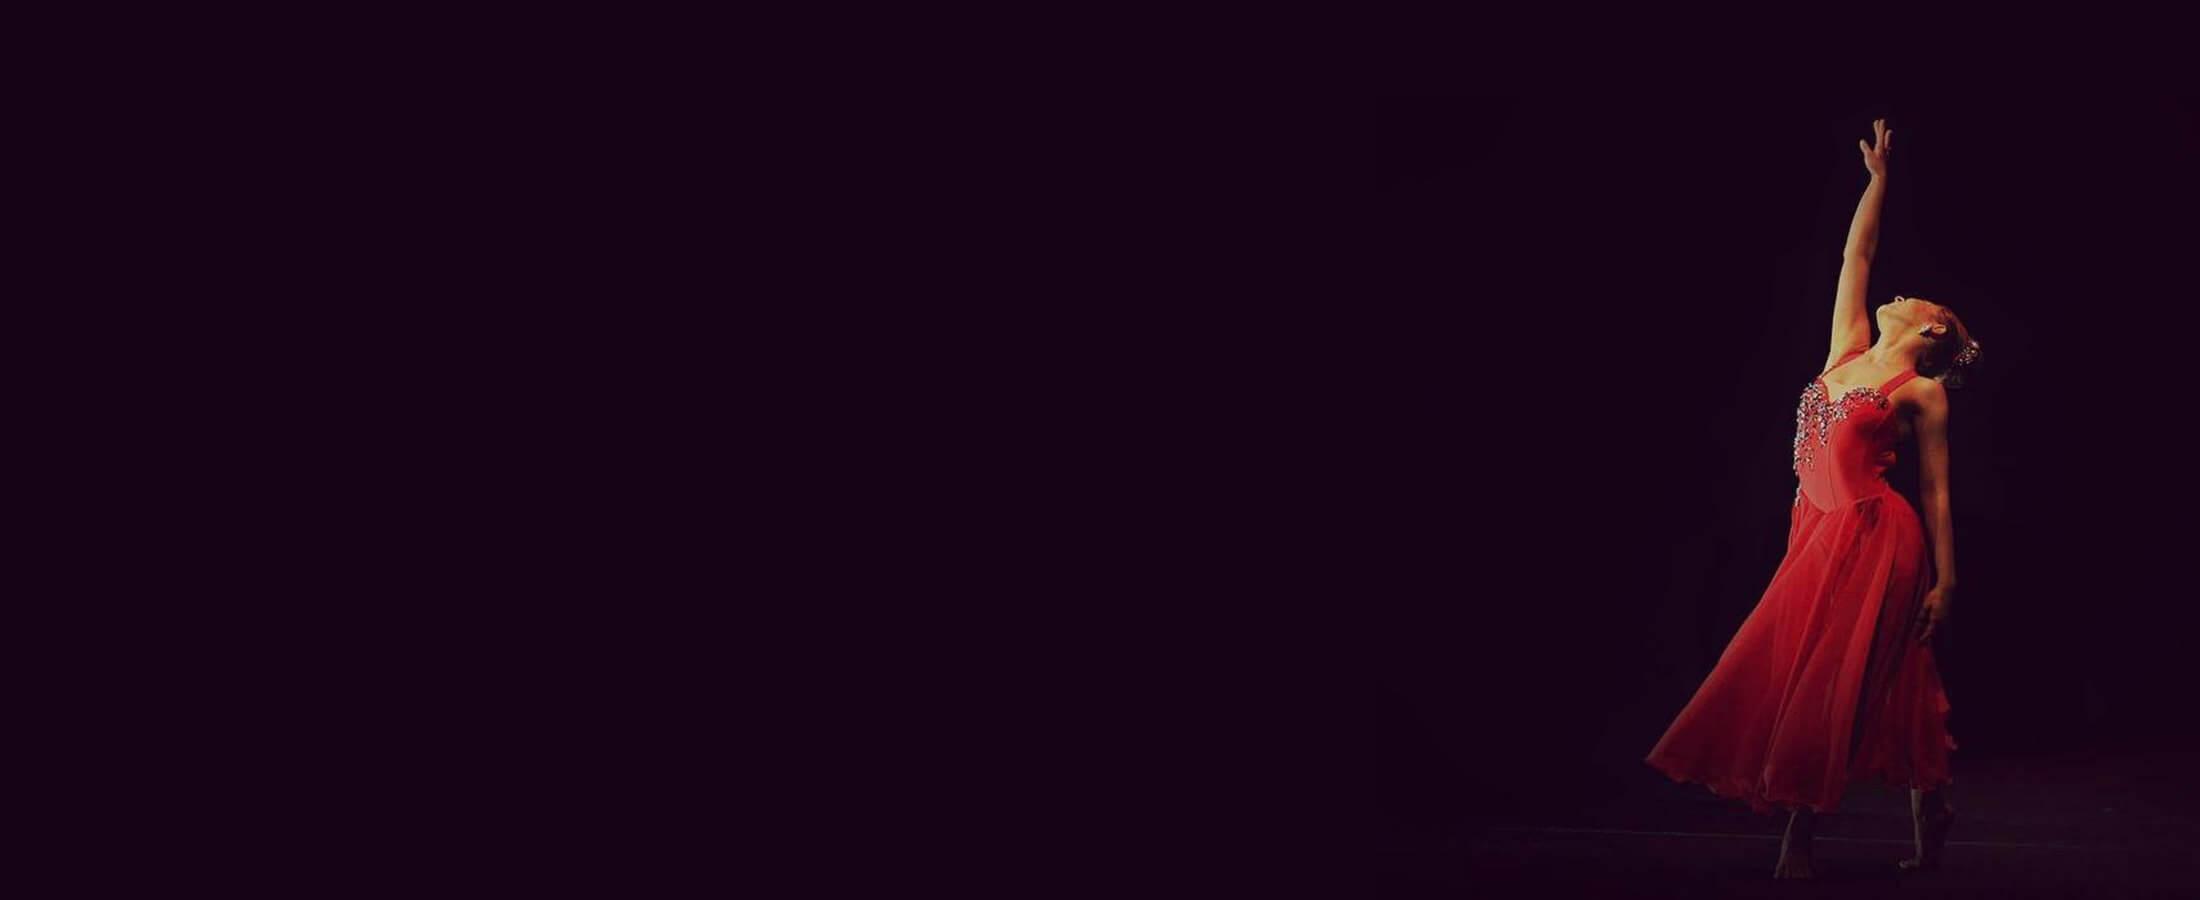 Ceres Calisthenics solo perfomer